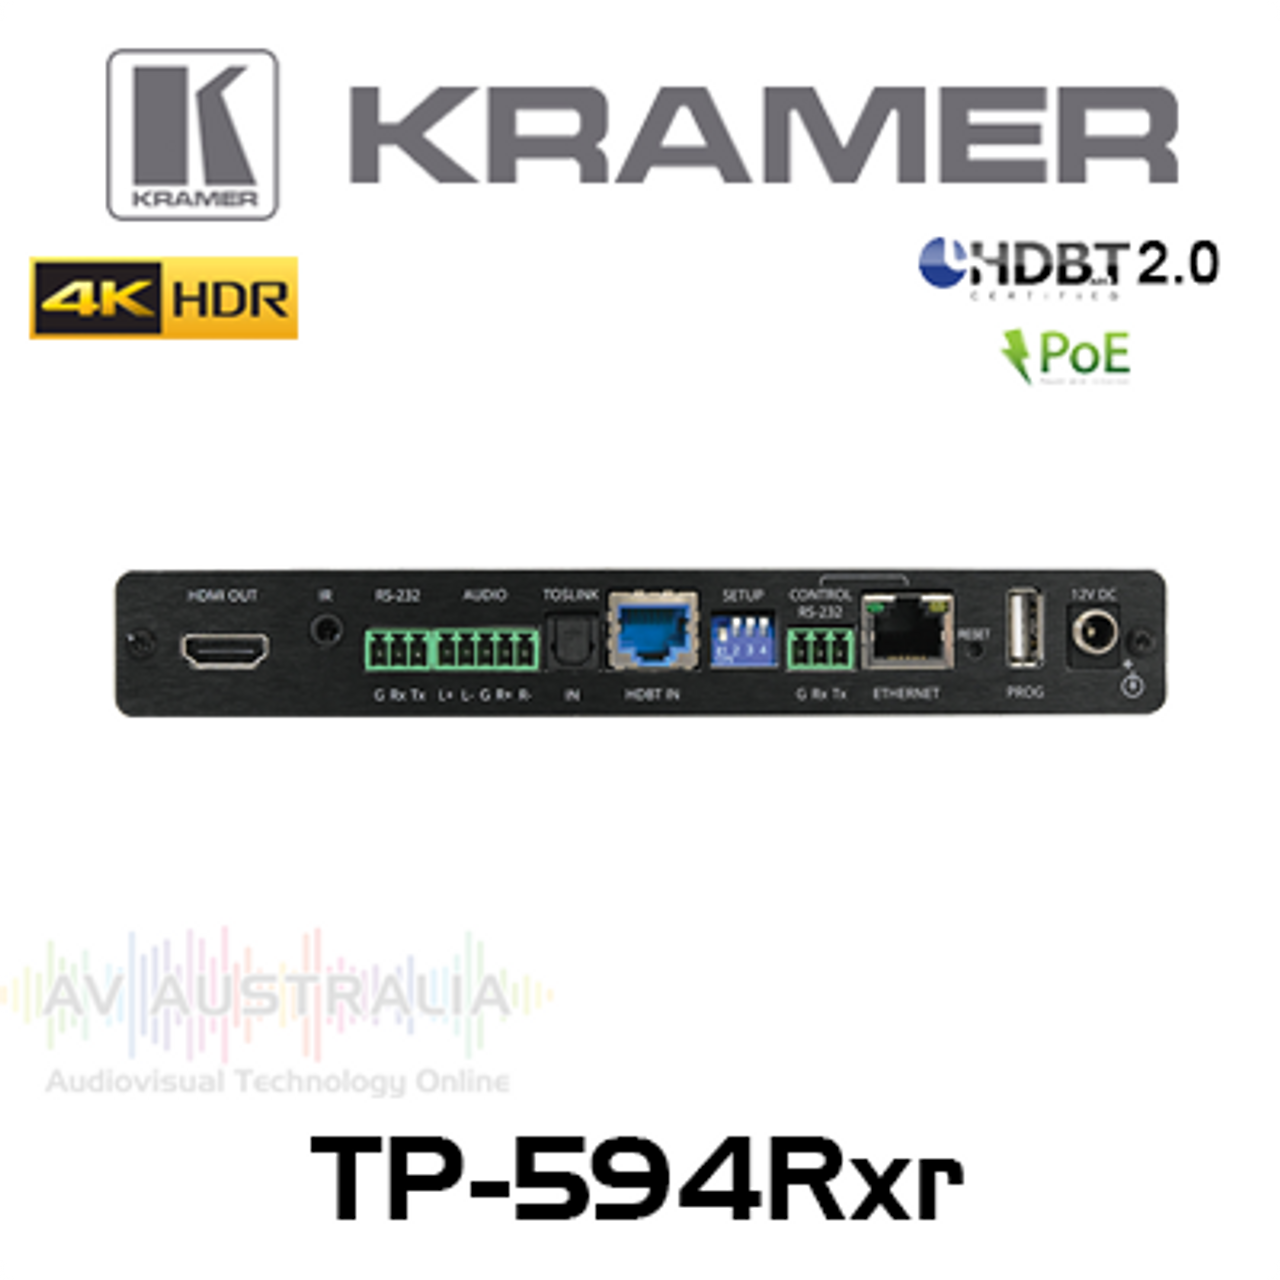 Kramer TP-594RXR 4K HDR HDMI Over HDBaseT 2.0 PoE Receiver w/ Ethernet, ARC, Audio, RS-232 & IR (100m)